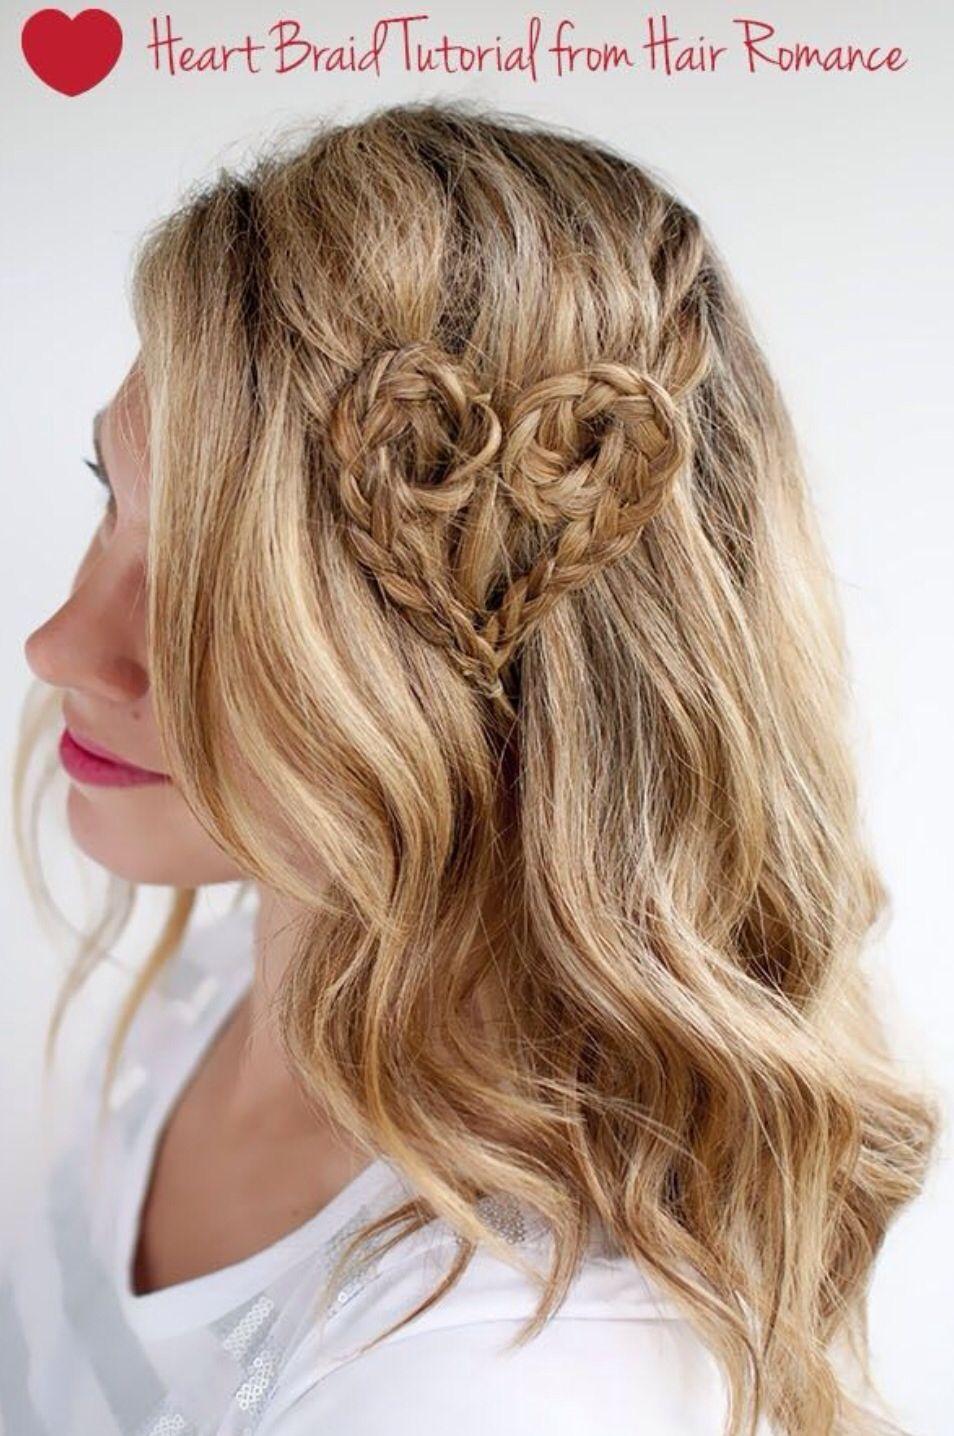 #heart #love #braid #plait #romance #hair #aesthetics #hairandbeauty #midlandshairdresser  http://aesthetics-solihull.com